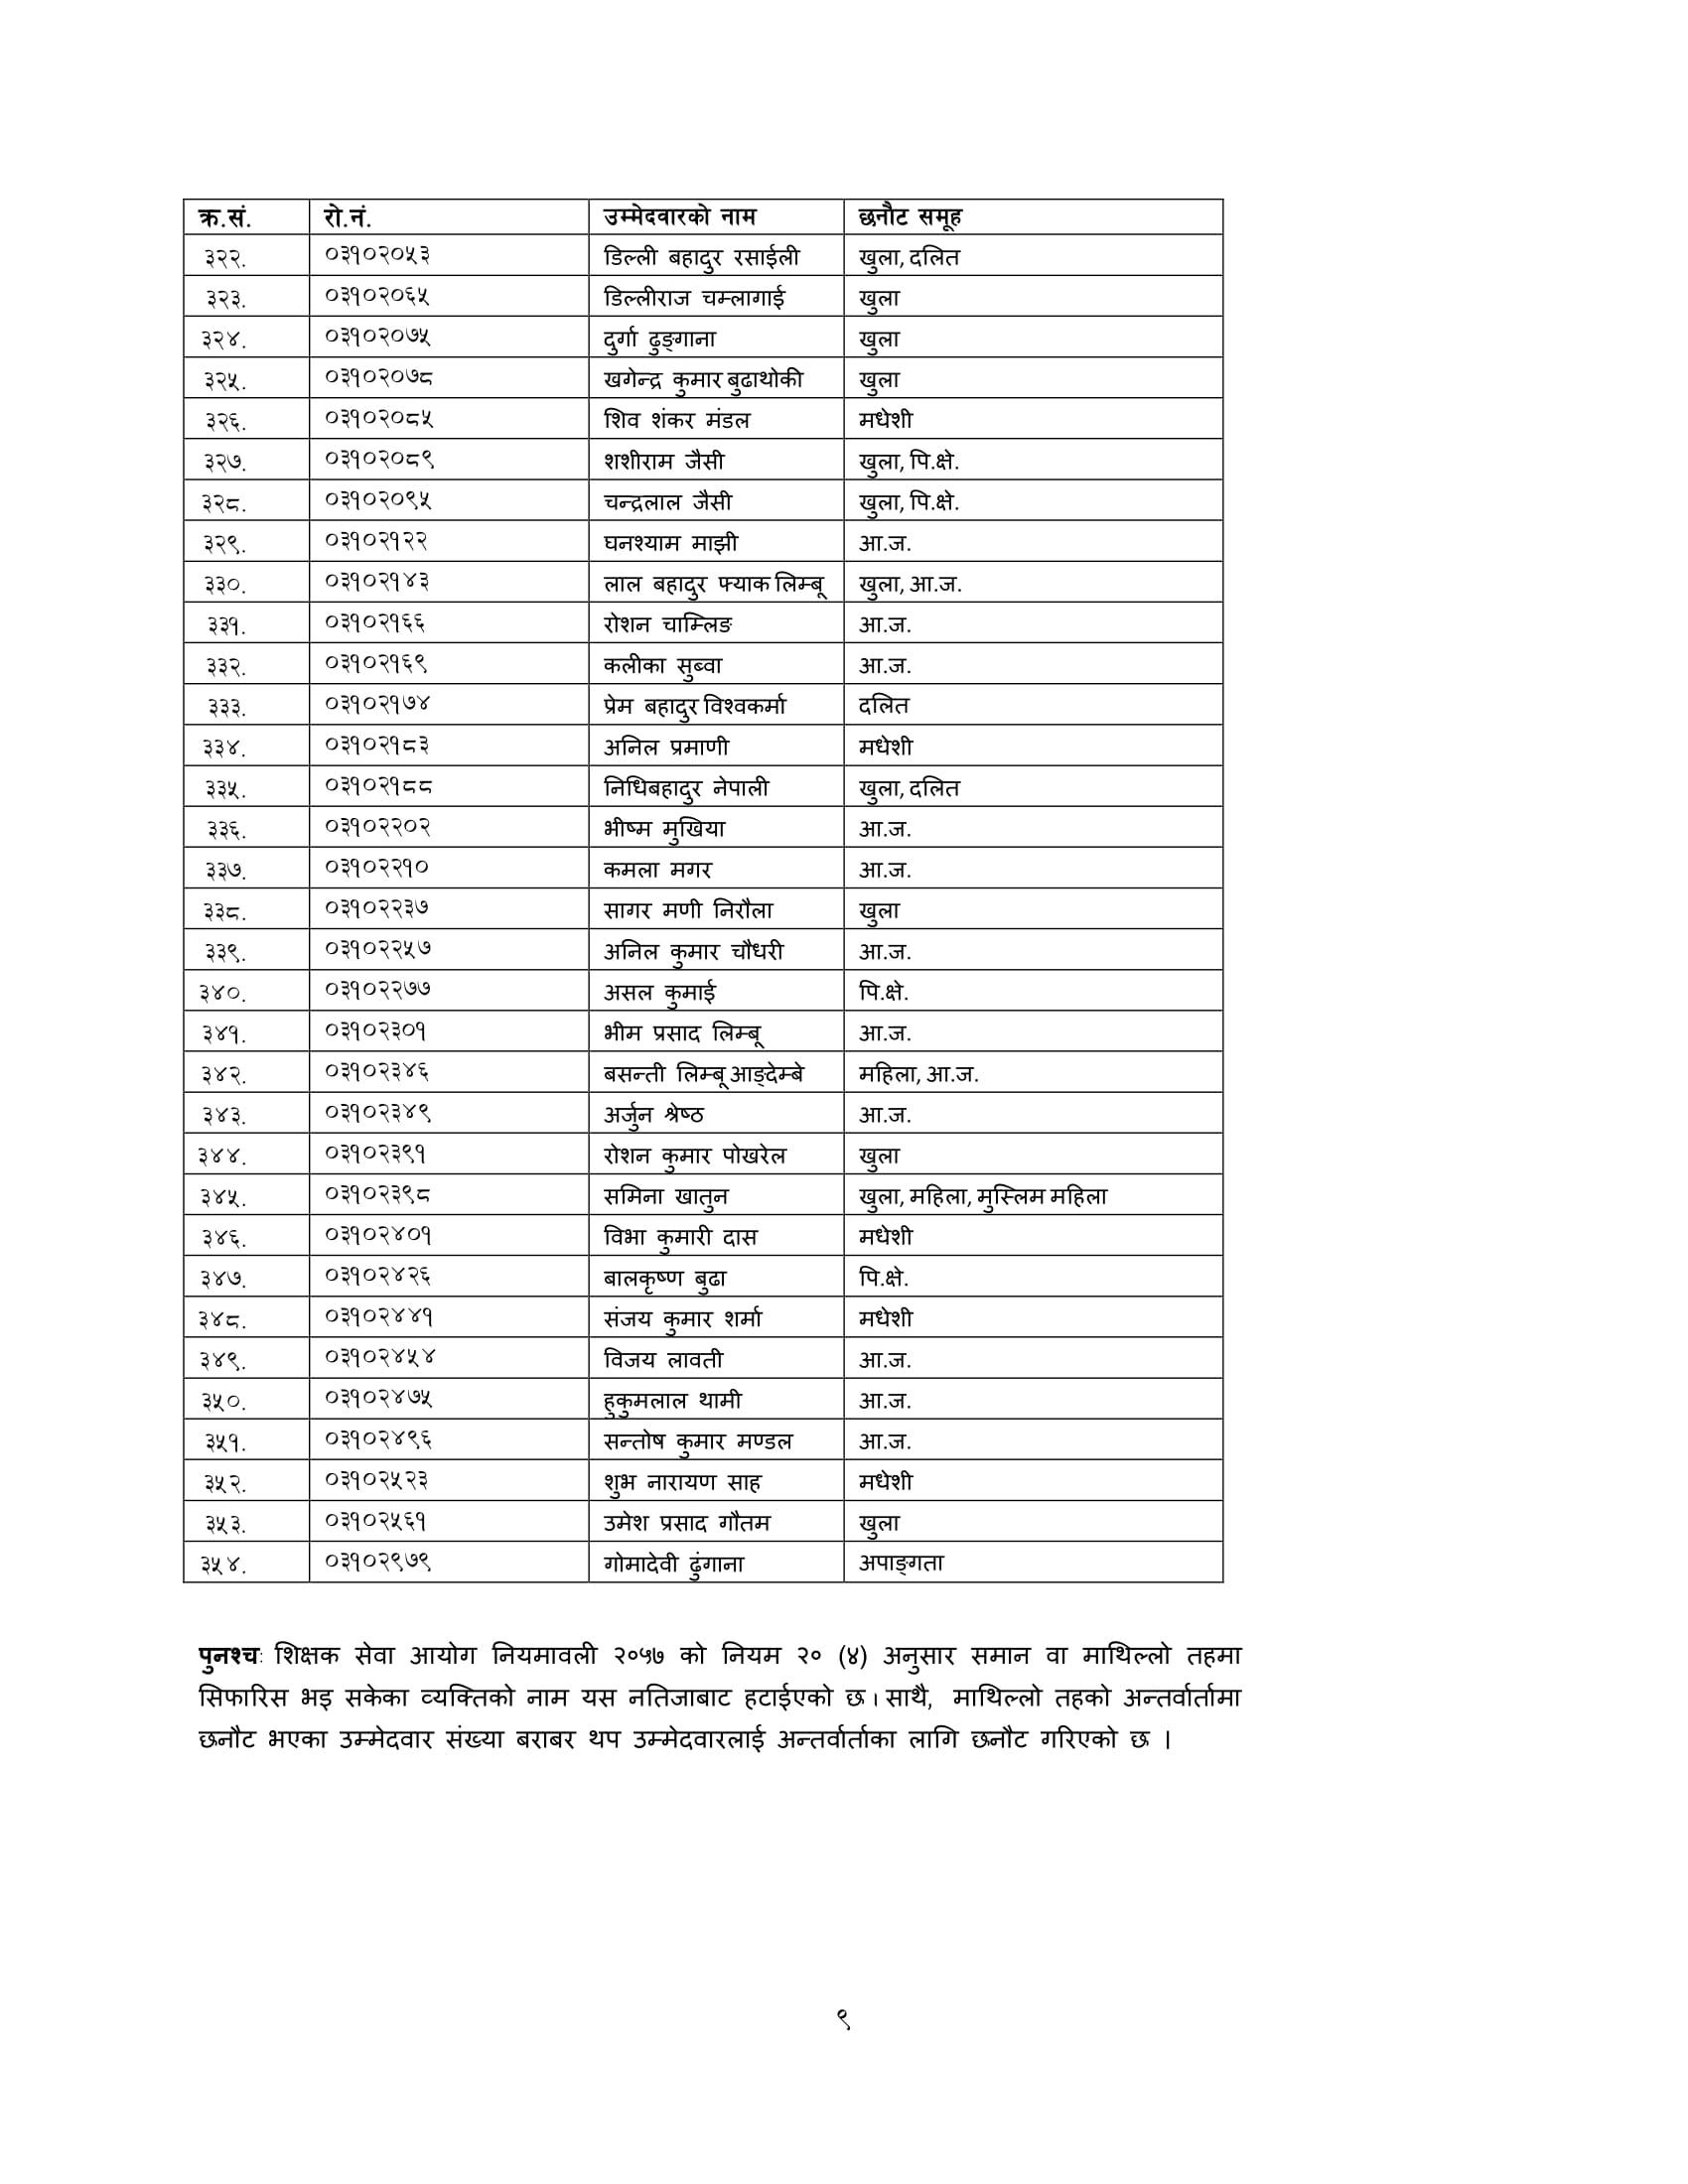 commision on teacher credentialing, TSC exam result darchula,TSC result darchula,TSC exam result darchula,TSC result darchula,TSC open exam result ,TSC open result ,TSC open exam result ,TSC open result ,shikshak sewa aayog 2075 primary level result,shikshak sewa aayog 2075 result, shikshak sewa aayog result primary level, shikshak sewa aayog 2075 result, www.tsc.gov.np 2075 primary level result,www.tsc.gov.np.com 2075,tsc.gov.np result 2075,www.tsc.gov.np result 2076,www tsc result 2075,2075 TSC exam result  ,2075 TSC Result,Online Result TSC Nepal , shikshak sewa aayog natija,TSC exam result  ,TSC internal exam result, TSC Nepal 2075 Internal Exam Result  ,TSC Nepal result,TSC Online Result  ,tsc result,primary level result,shikshak sewa aayog result, shikshak sewa result, shikshak sewa natija , shikshak sewa Aayog natija 2075 , shikshak sewa natija 2075, Shikshak Sewa Aayog Result, Shikshak Sewa Aayog Result 2075, Shikshak Sewa Result,